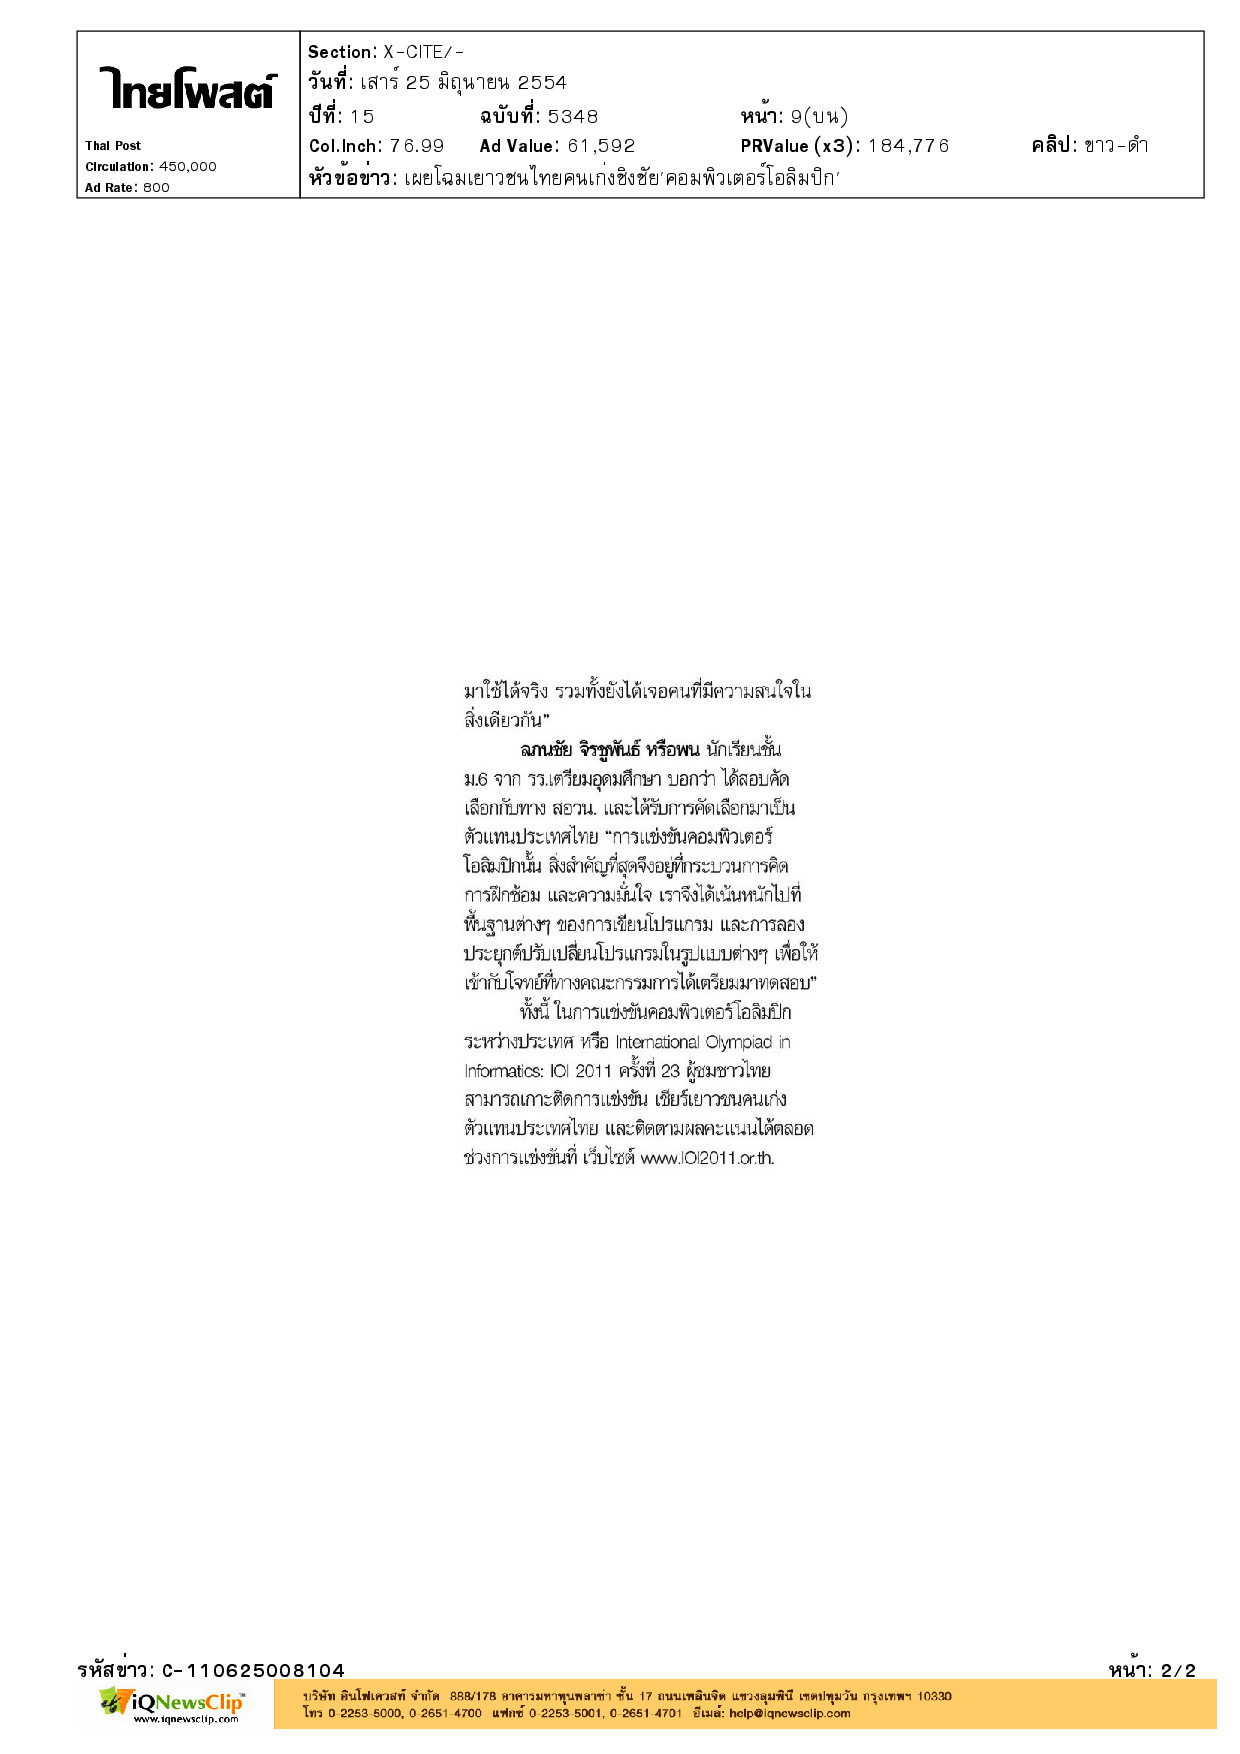 C-110625008104.pdf-1